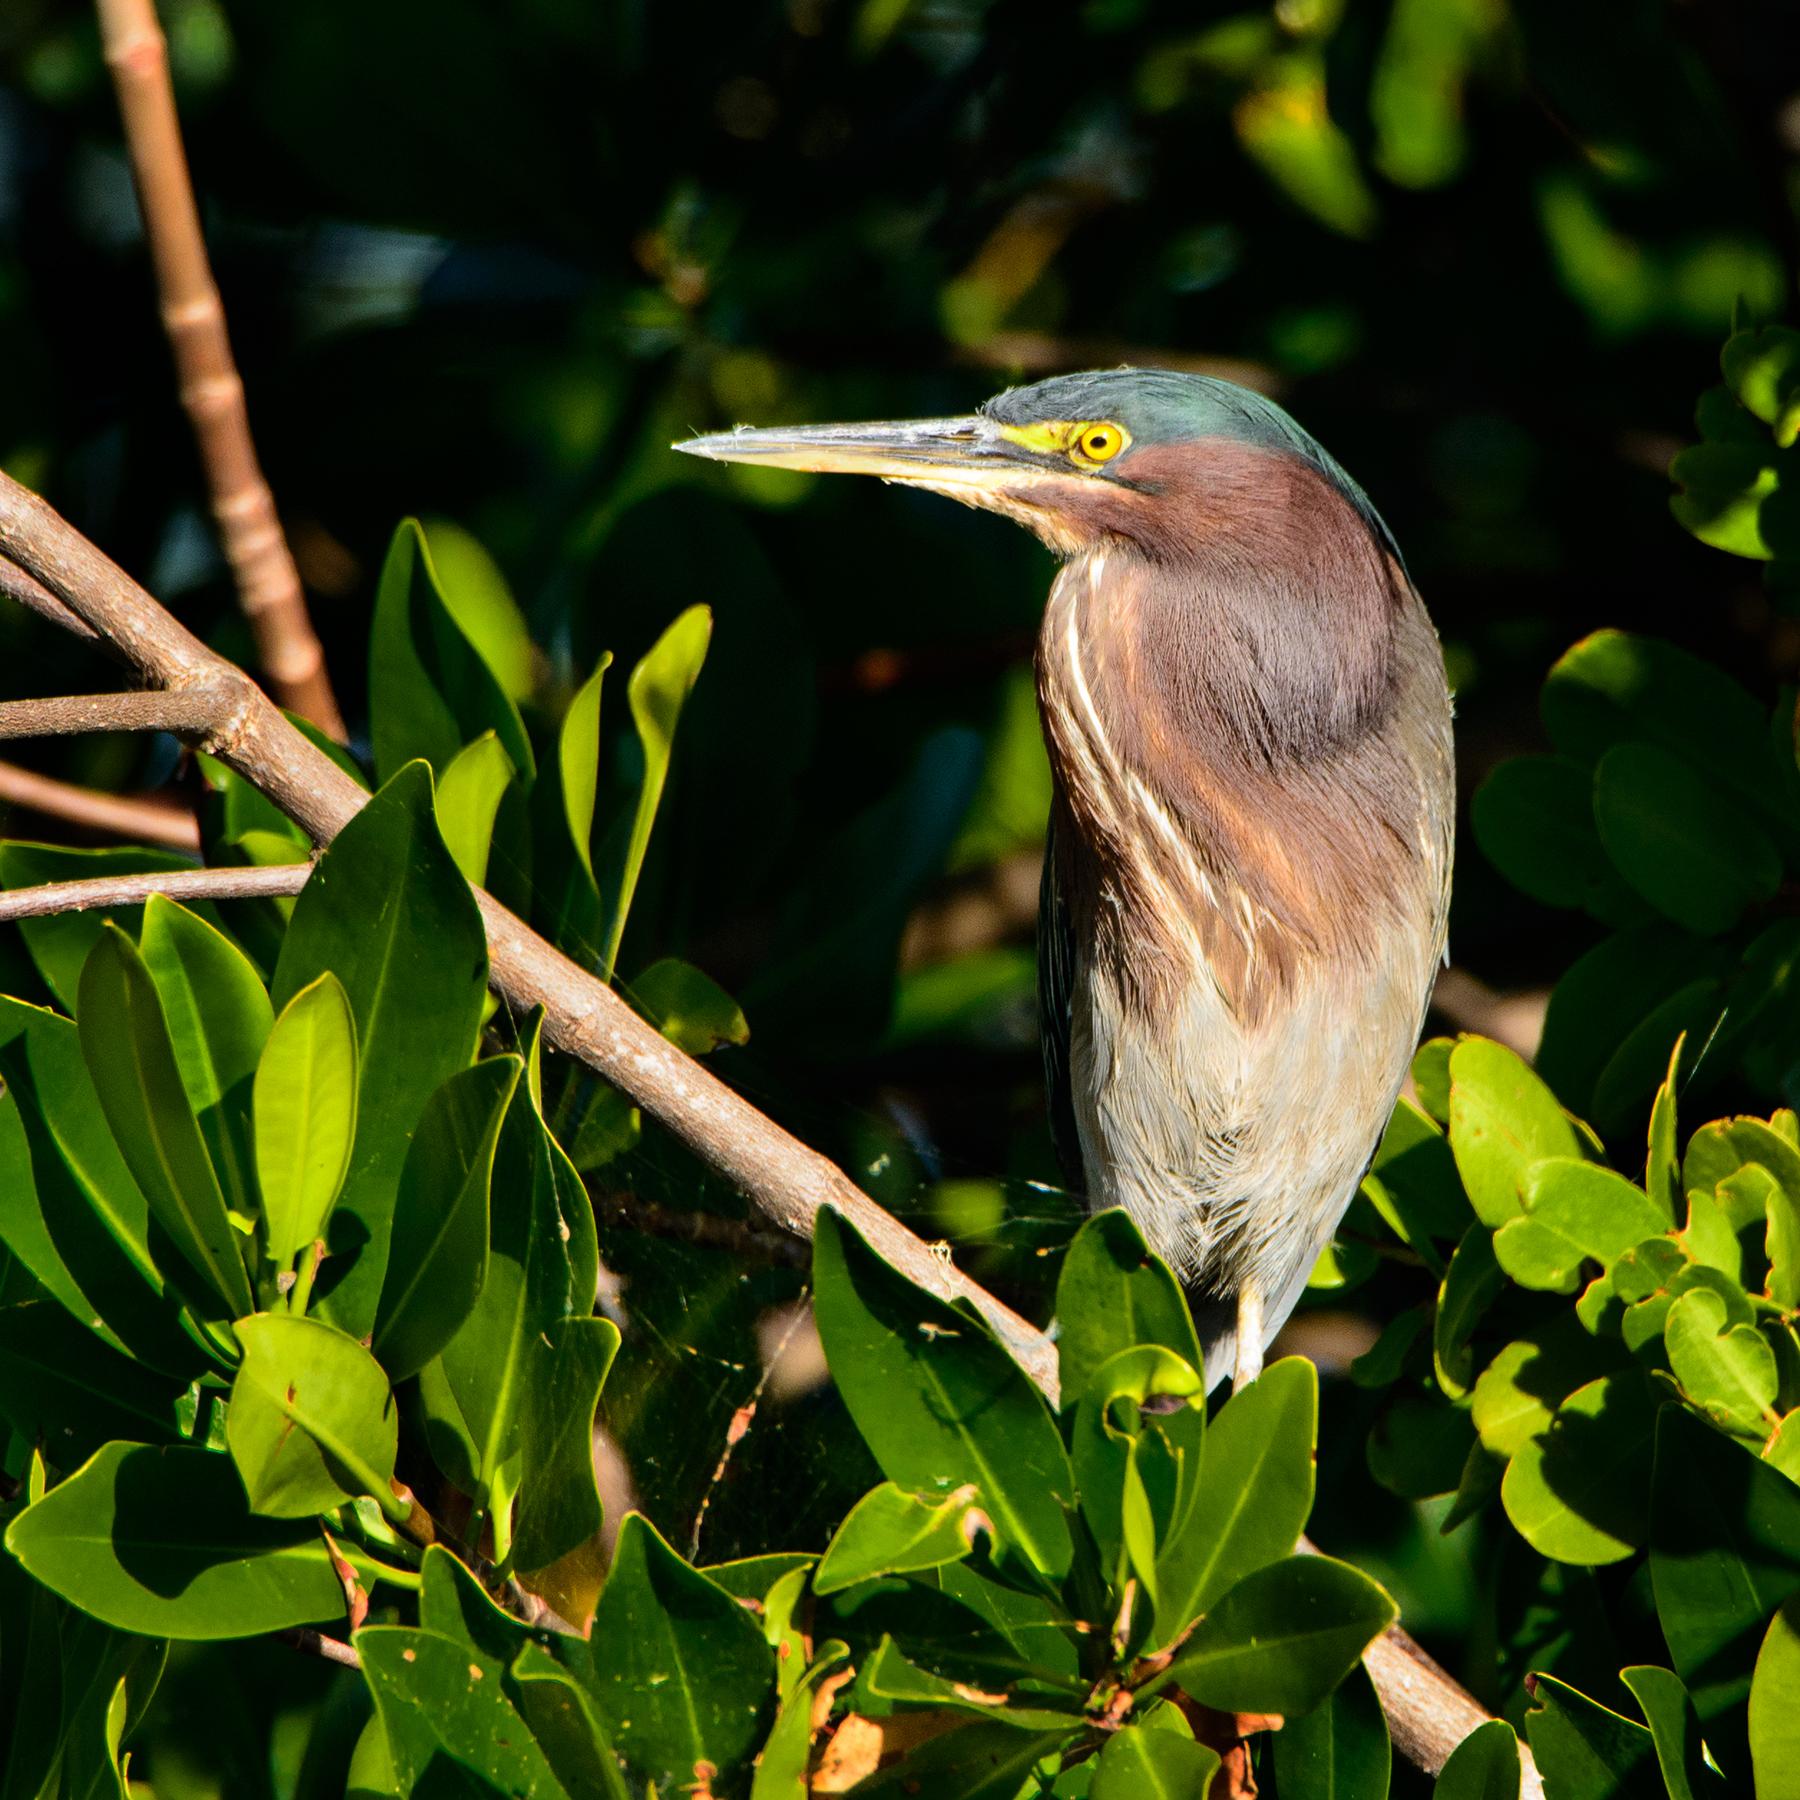 #greenheron, #sanibel, #florida, #bird, #birdphotography, #heron, #nikon, #tamron, #reallyrightstuff